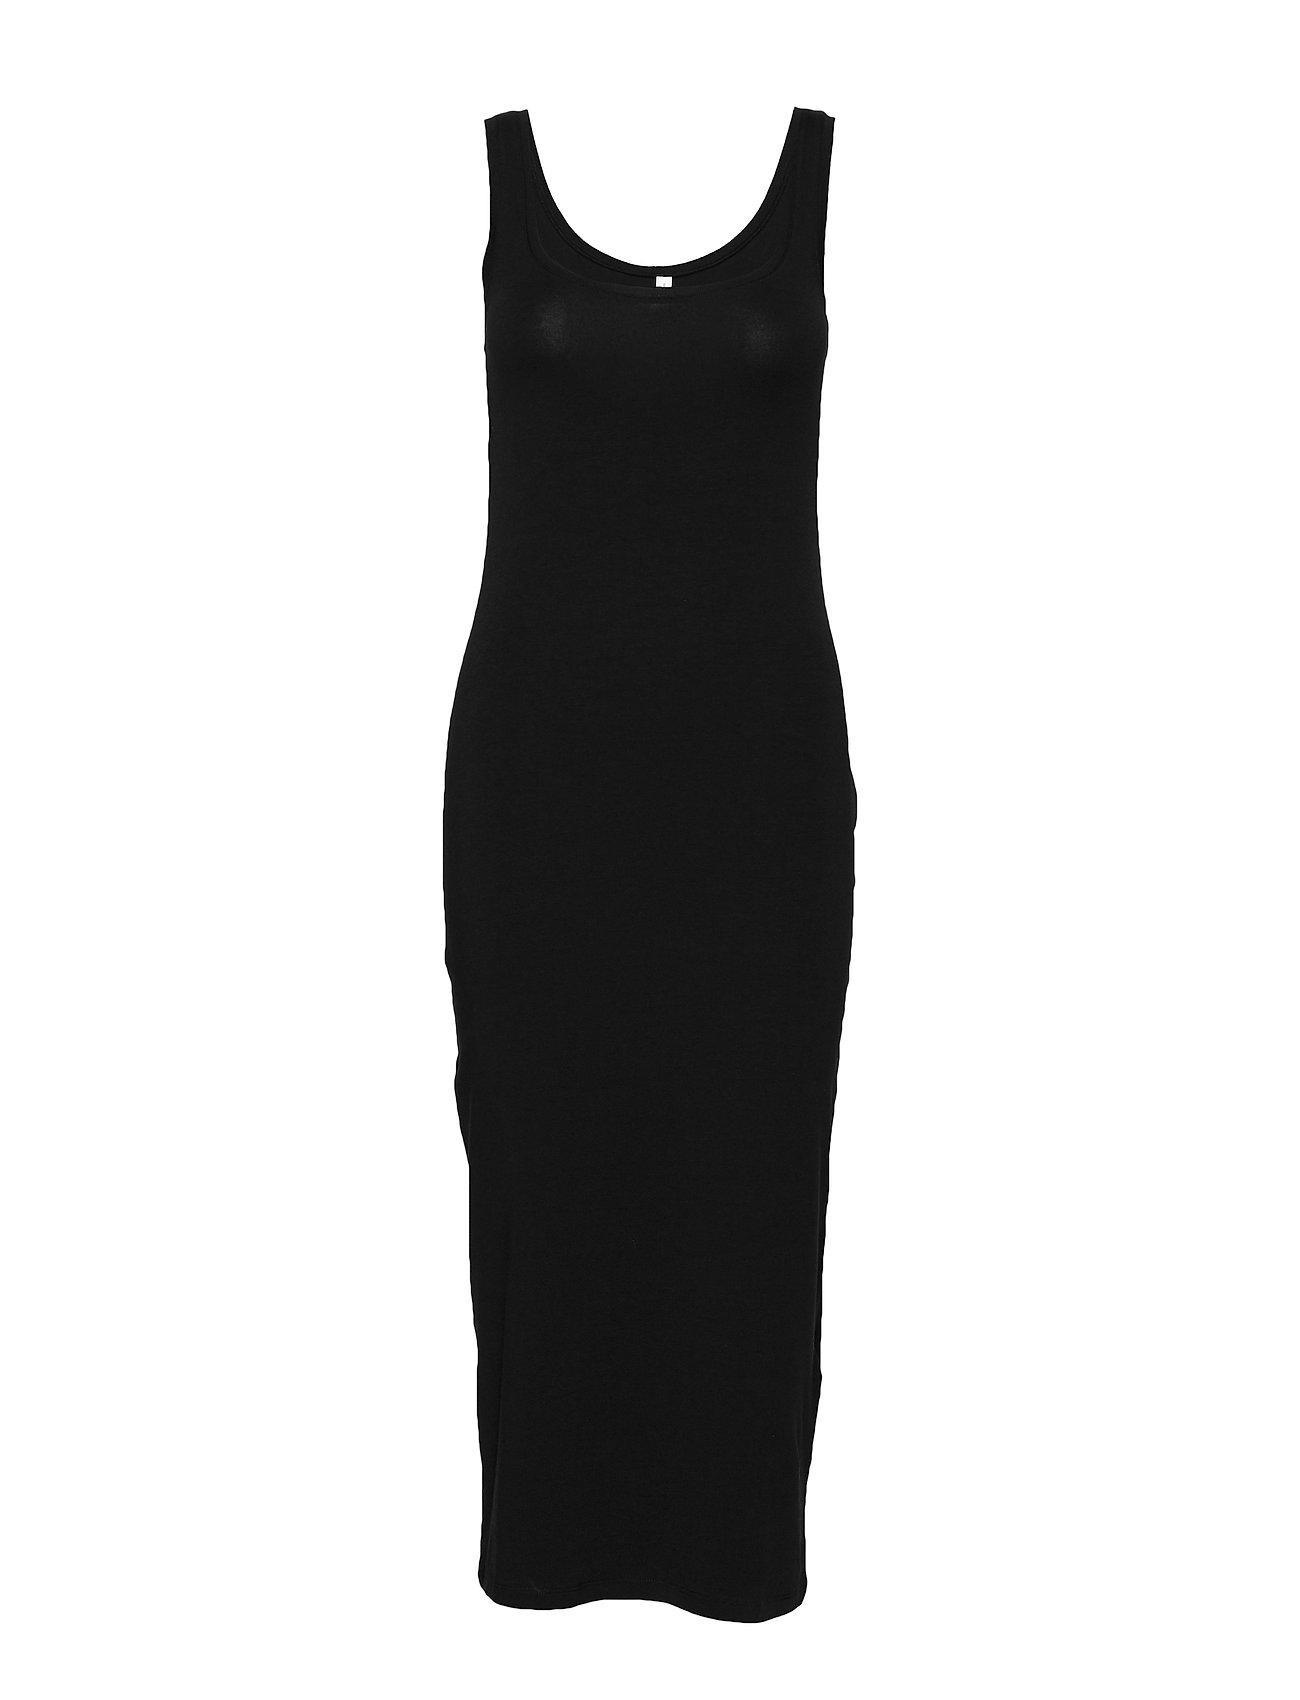 Samsøe Samsøe Suella long dress 265 - BLACK